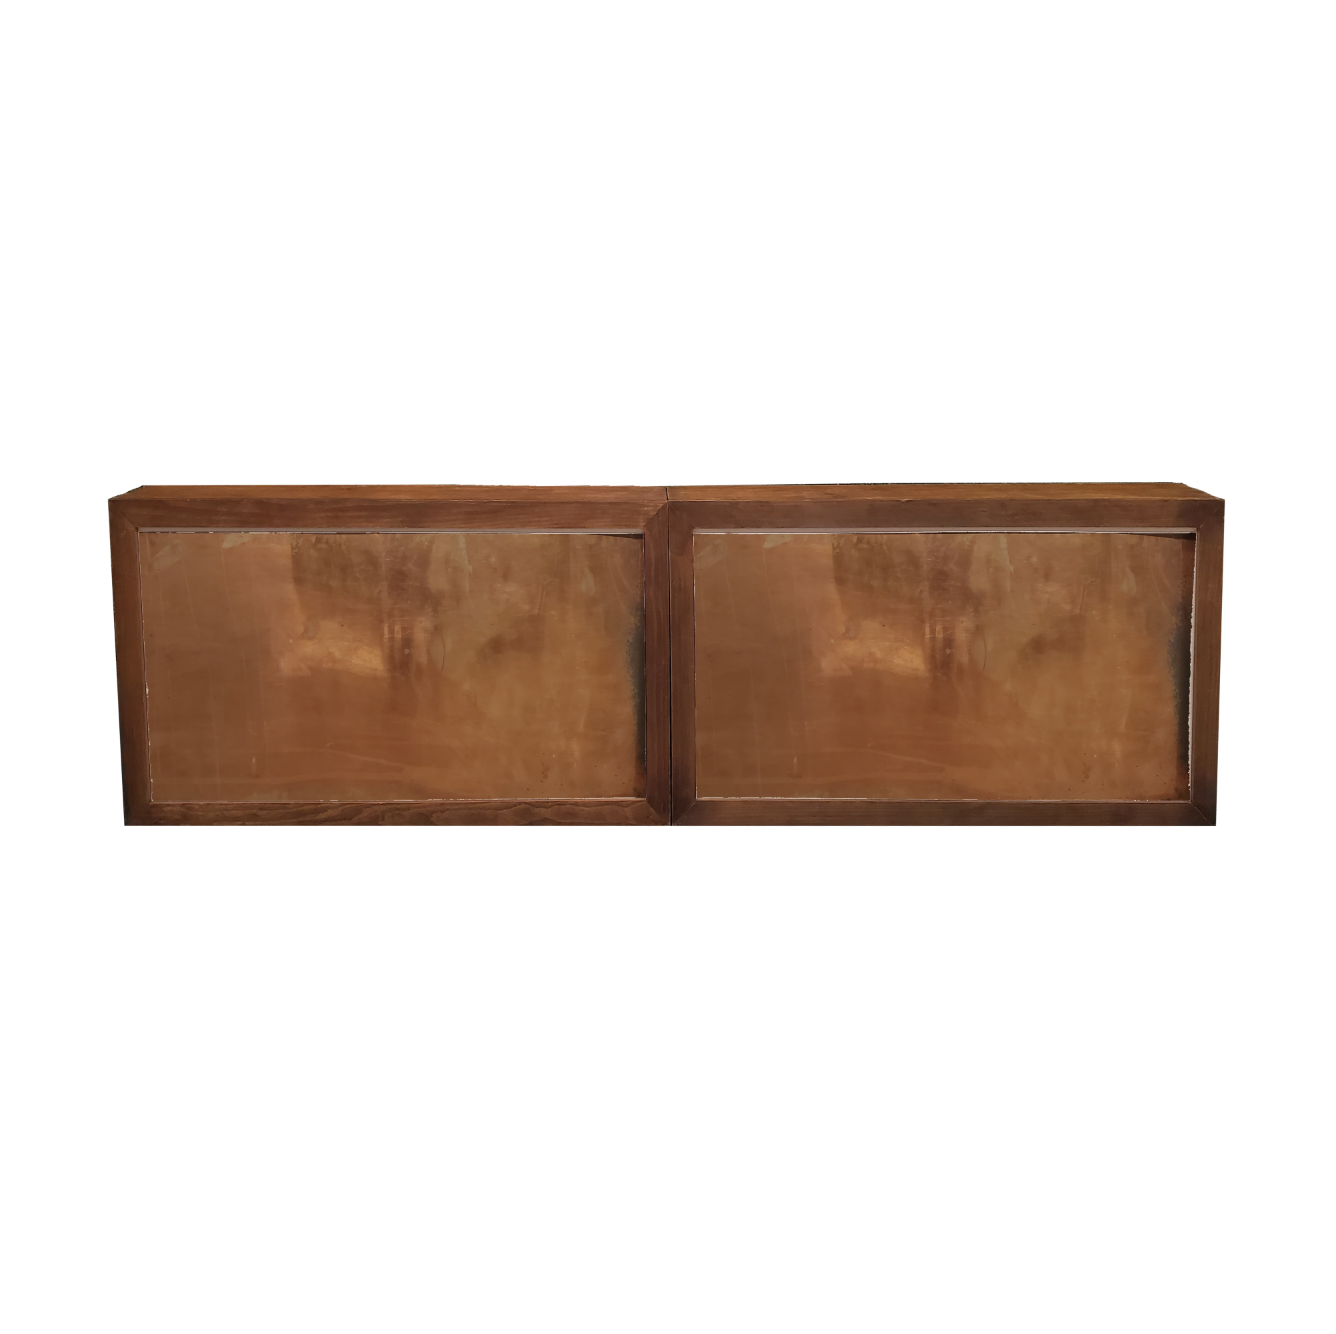 Double Wood Frame Bar/Copper Insert $400